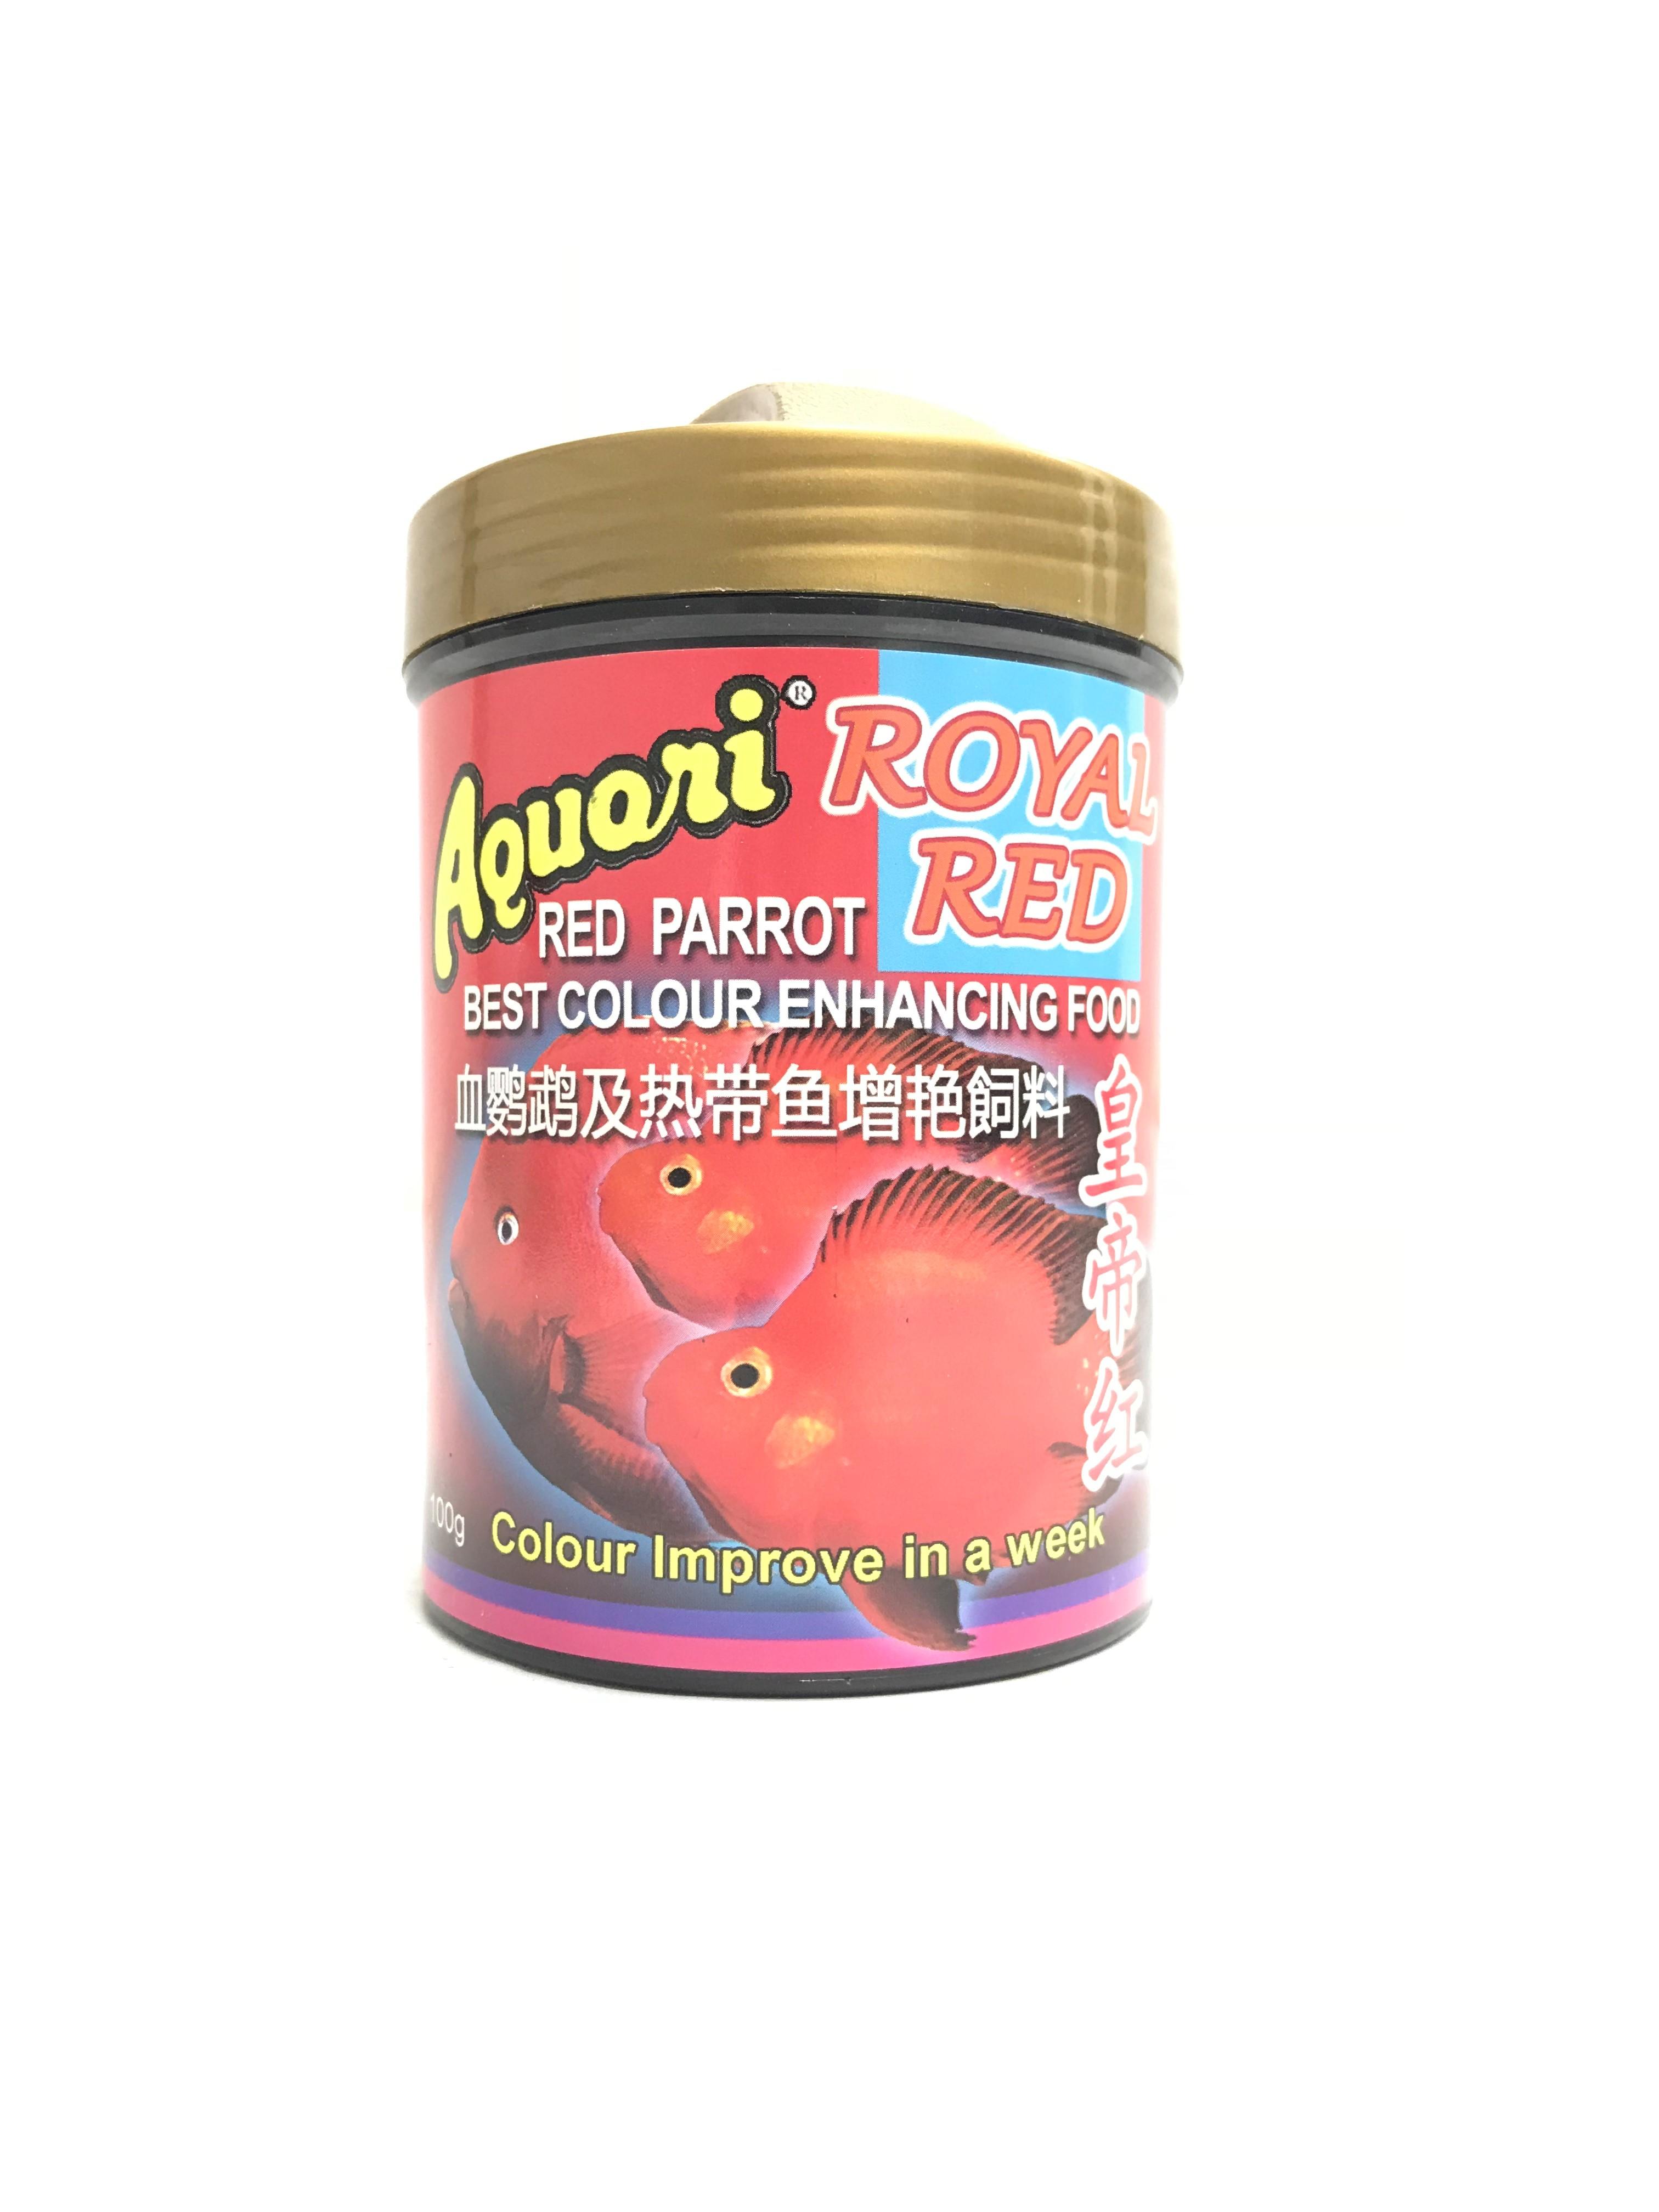 Aquori Royal Red Parrot